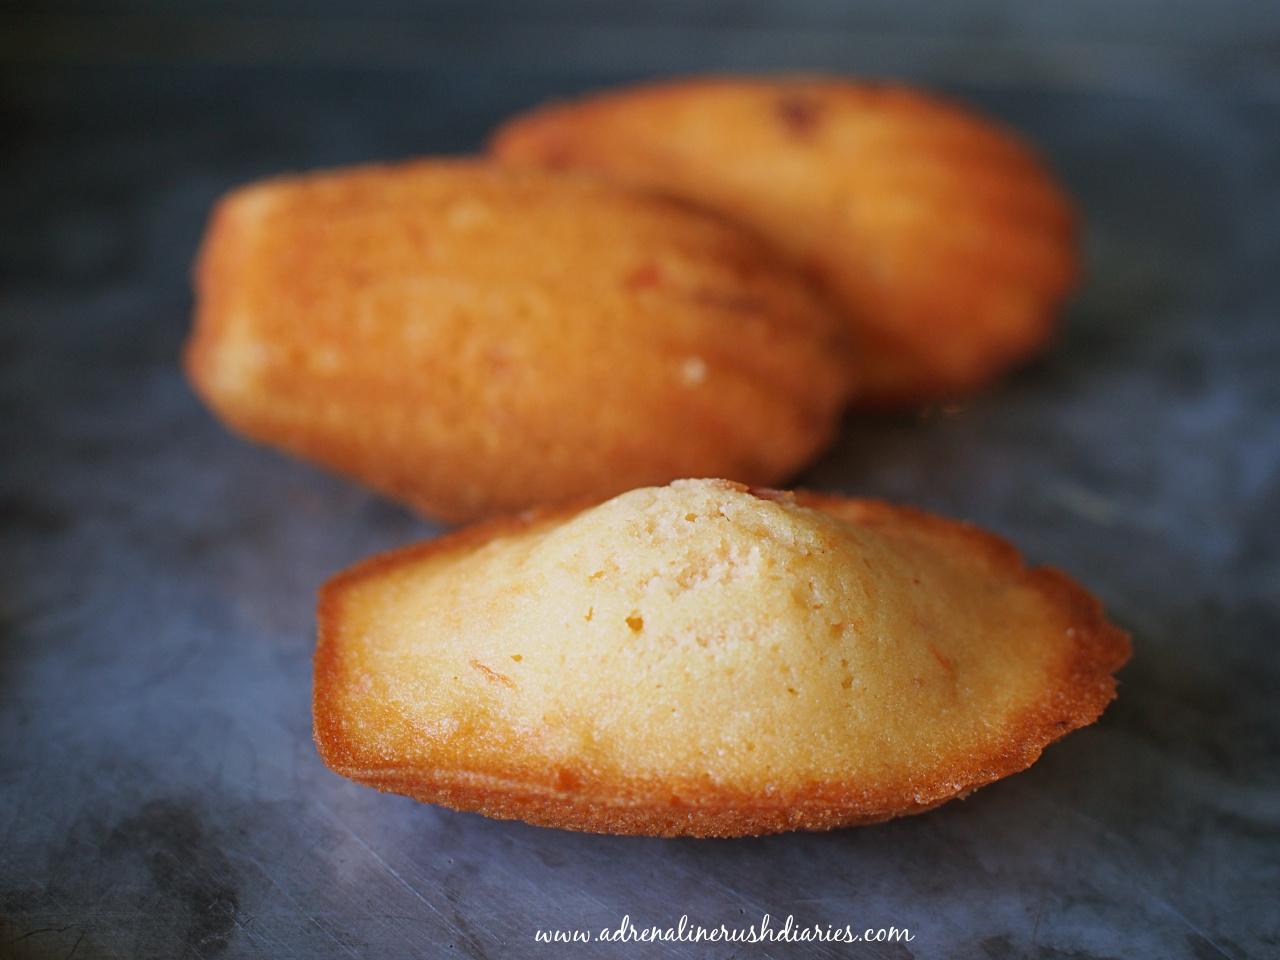 Candied Bael Fruit Madeleines แมดเดเลนมะตูม